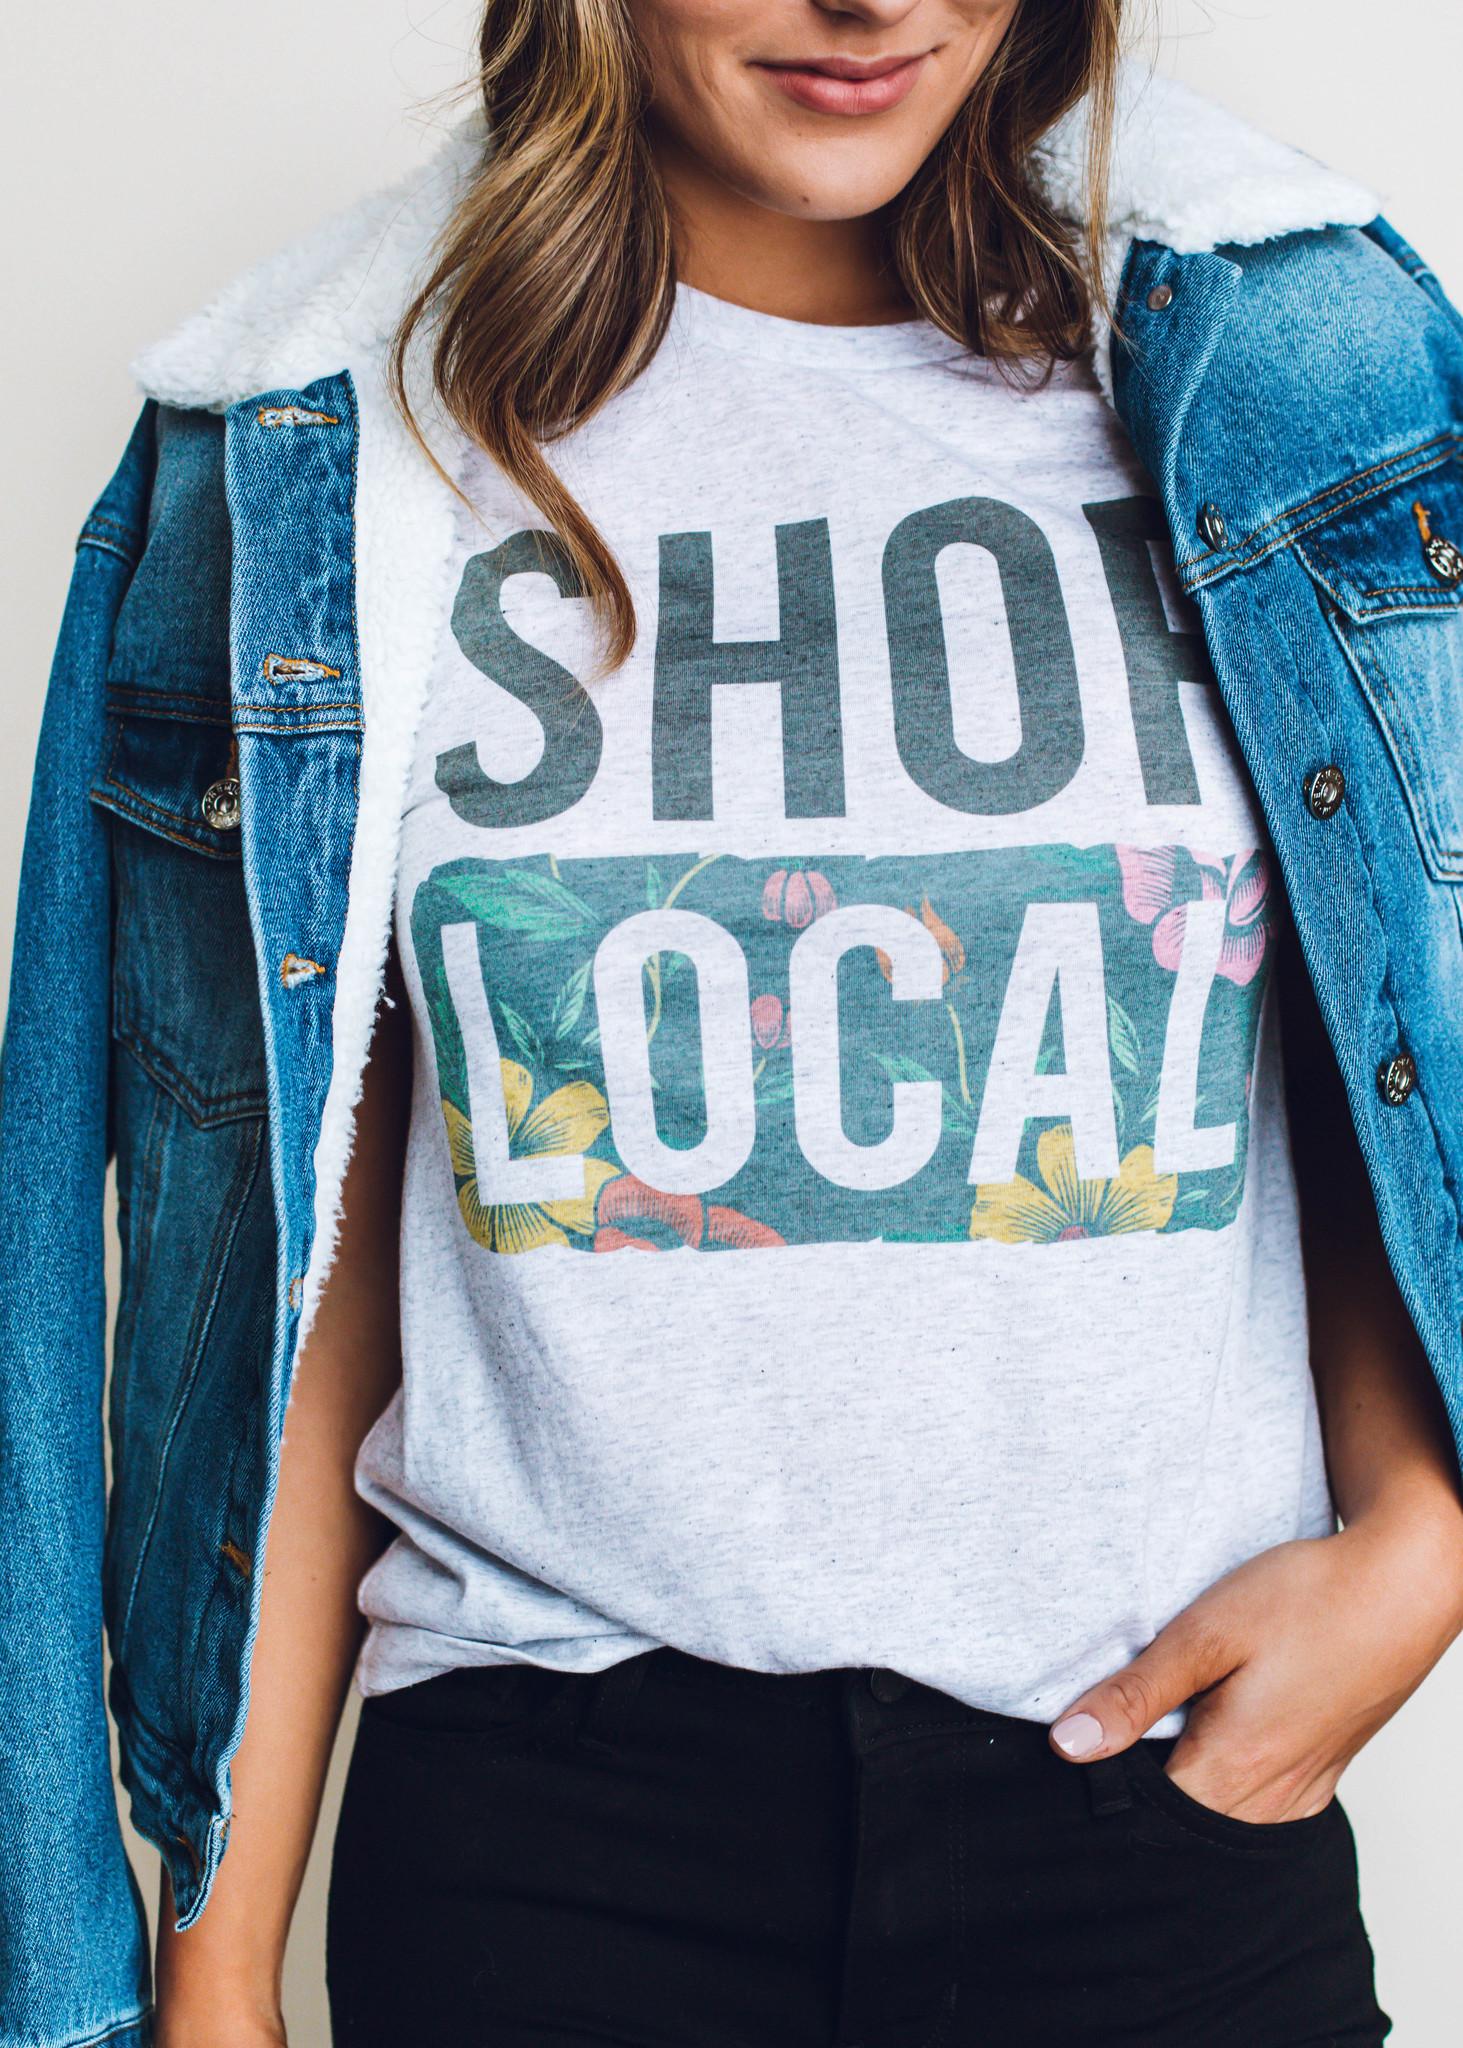 SHOP LOCAL GRAPHIC T-SHIRT